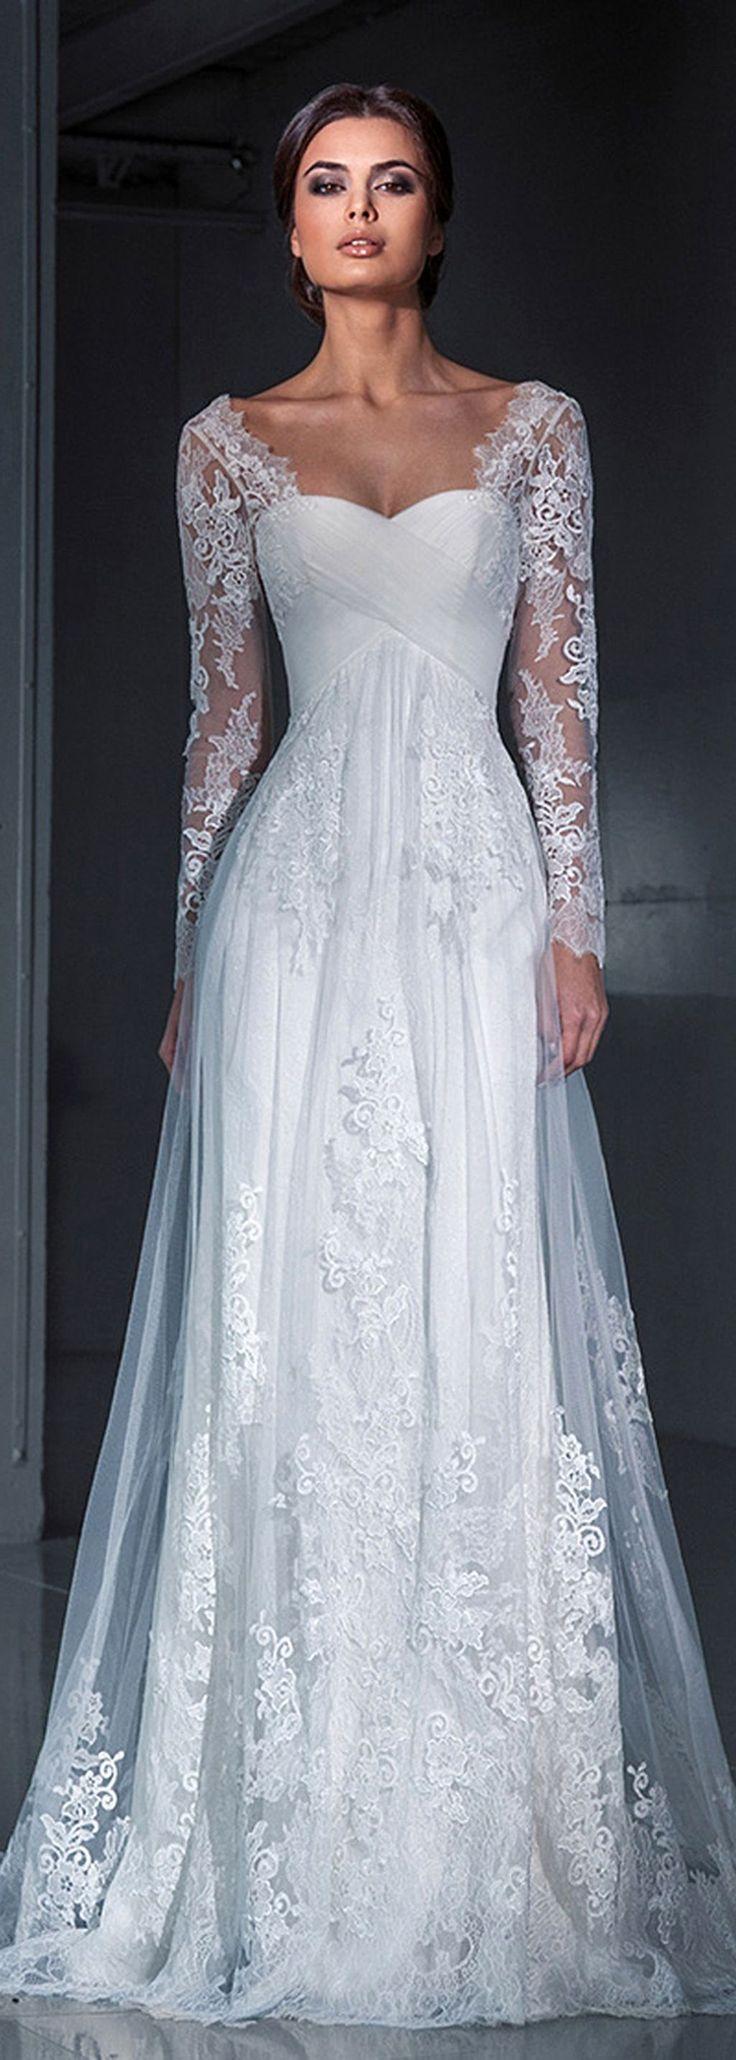 302 best Wedding Dresses images on Pinterest | Bridal dresses, Short ...